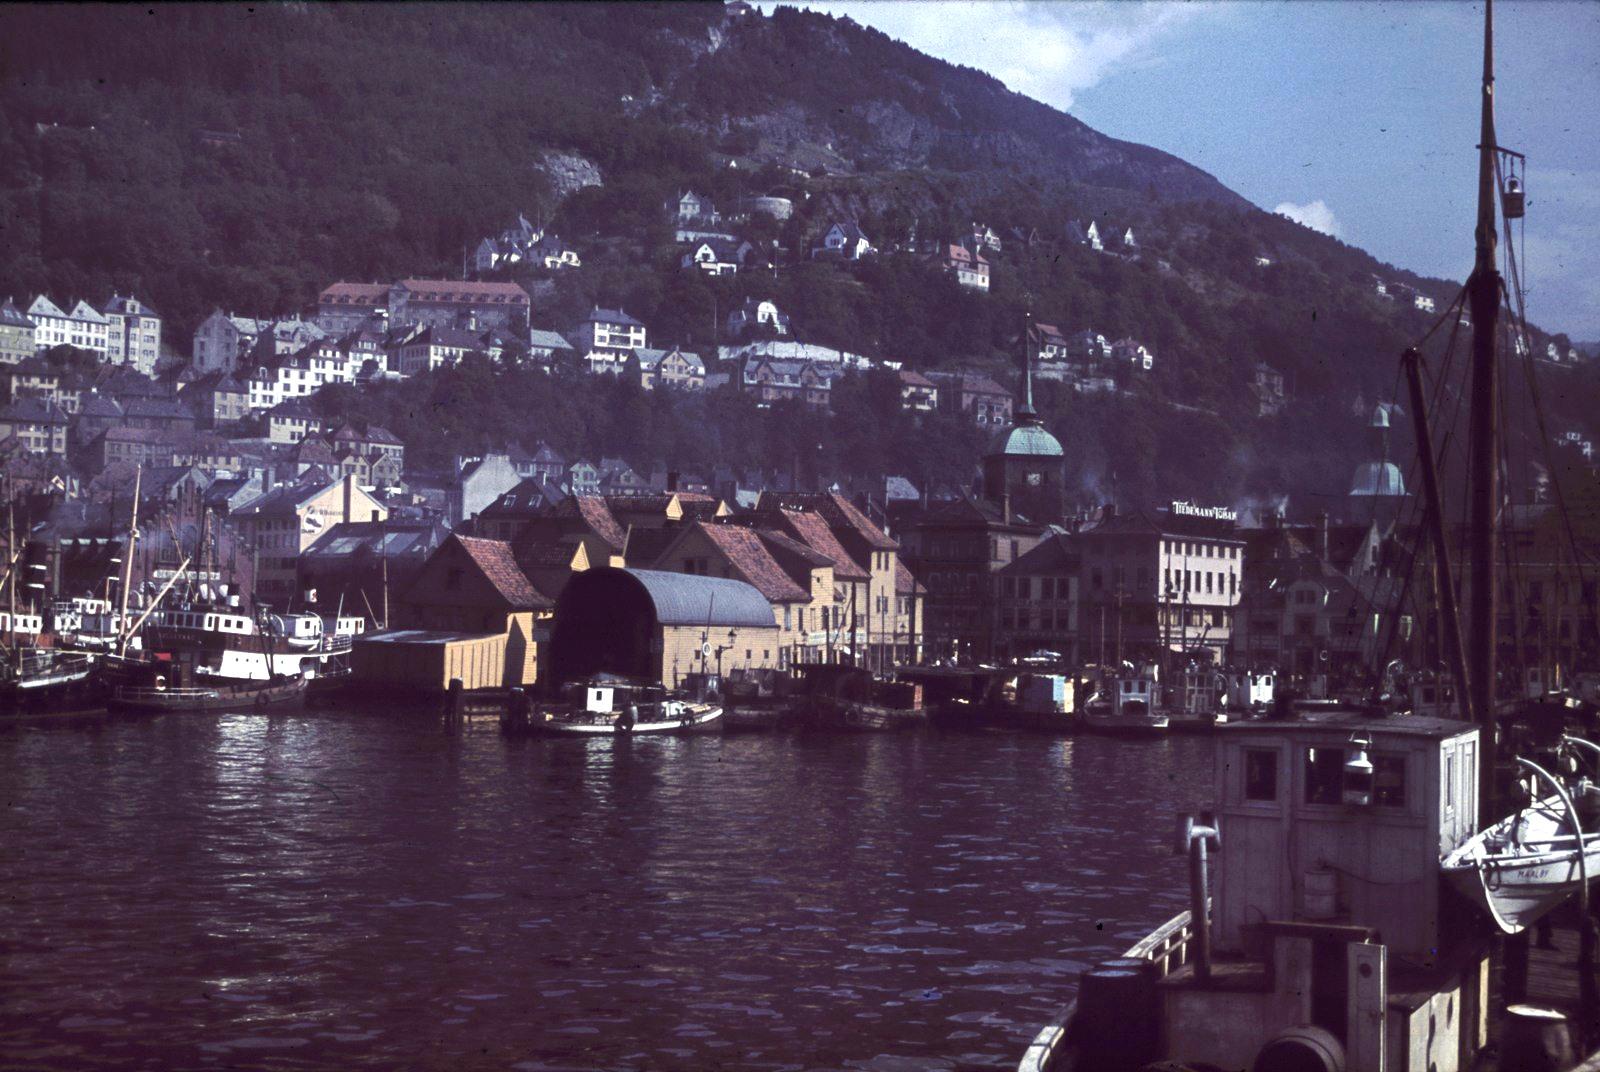 Берген. Вид с корабля на гавань и город